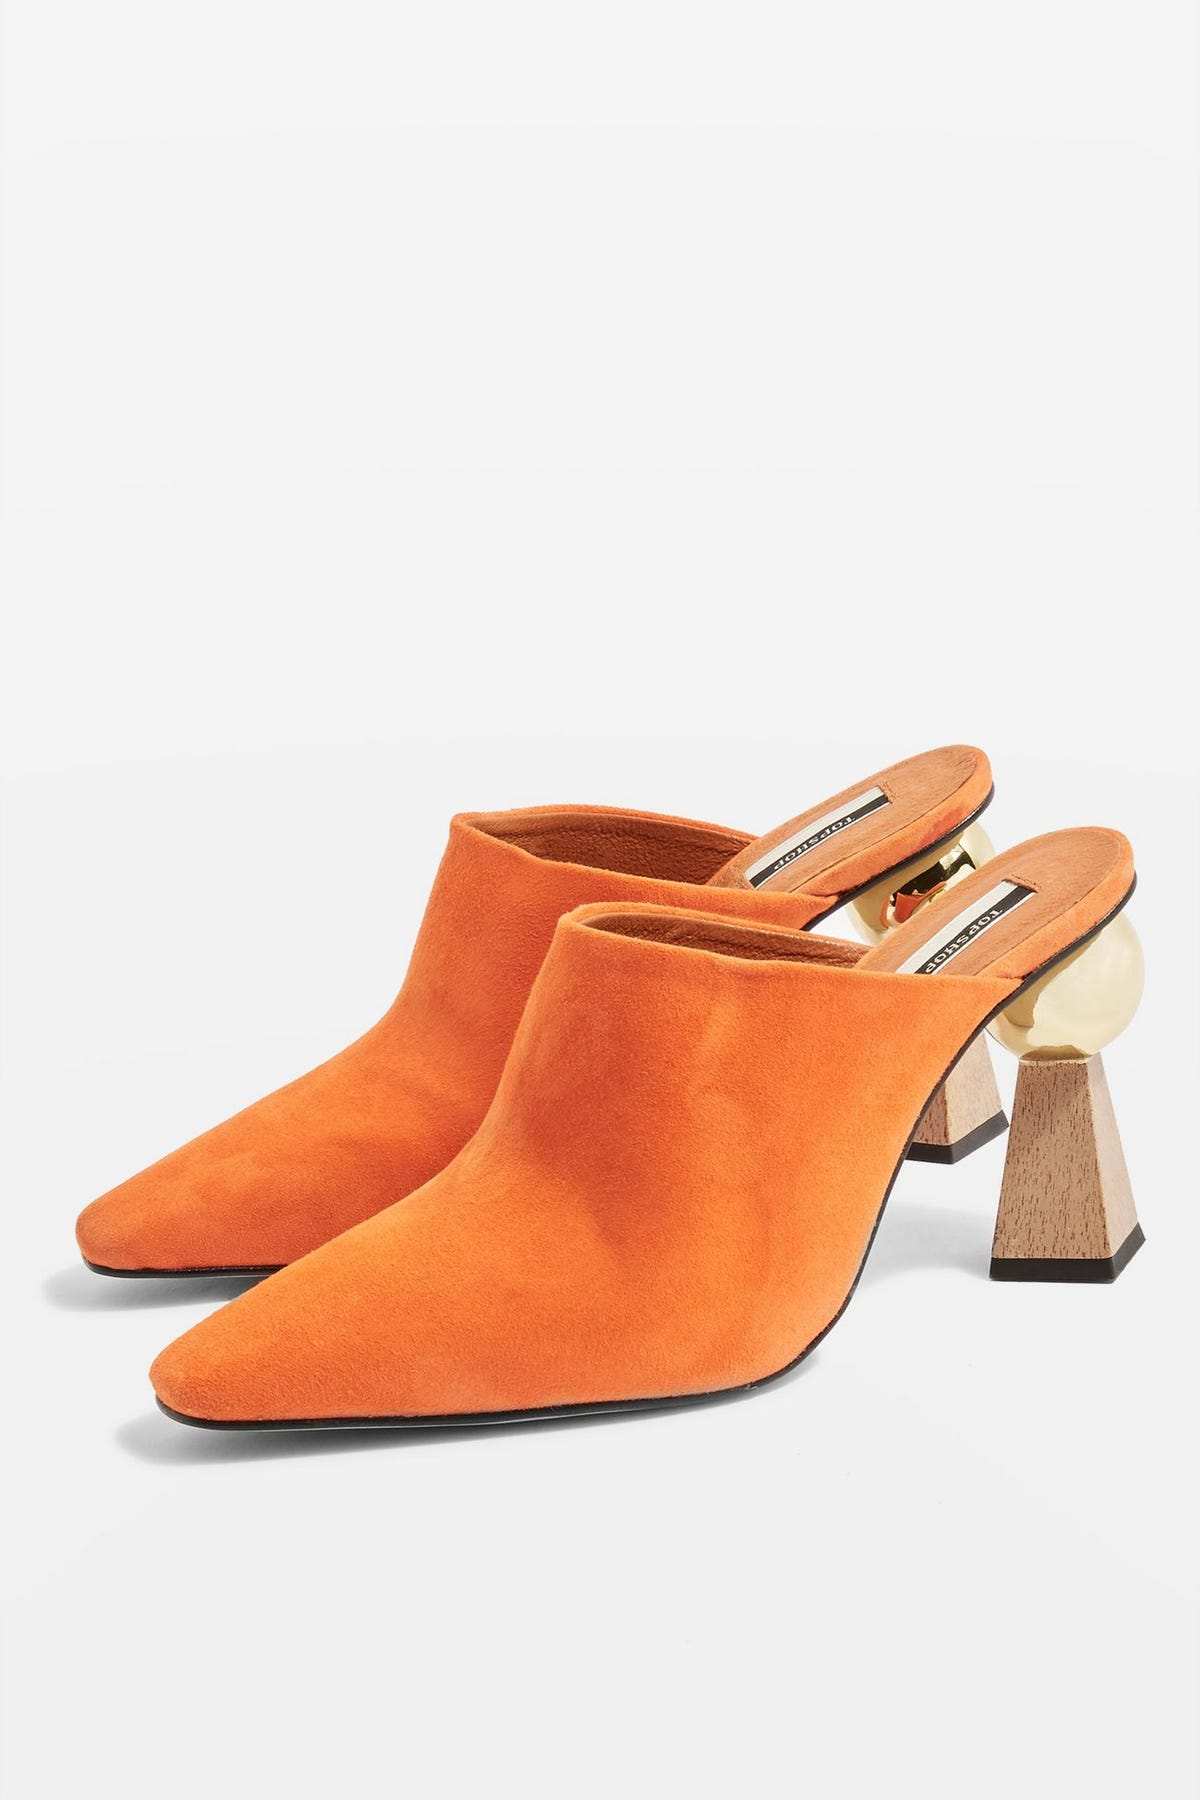 9e6e366f106 Sculptural Heels, The Work-Of-Art Shoe Trend You Need